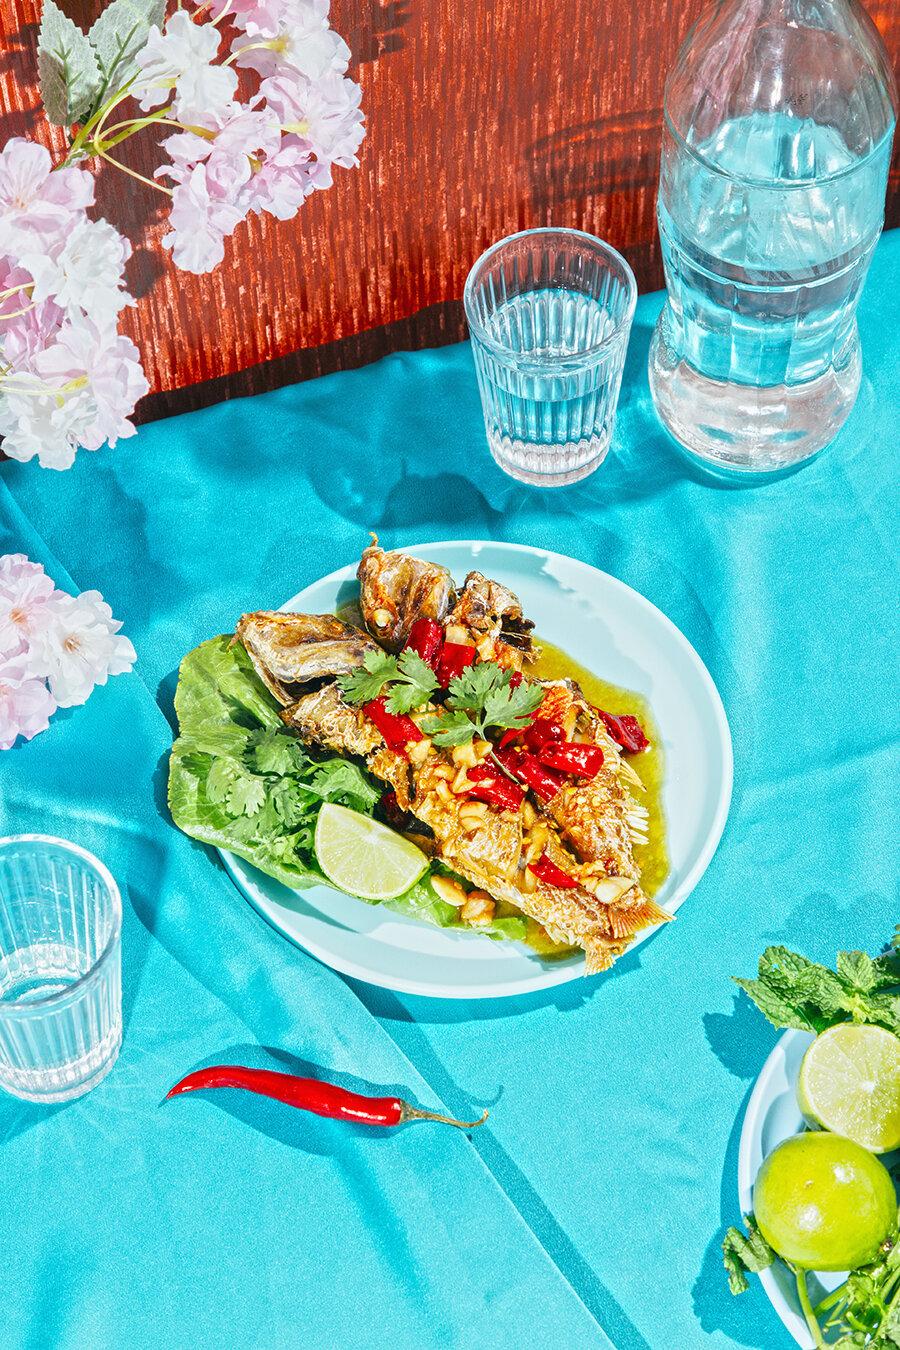 receta tailandesa de pescado frito con salsa de tamarindo